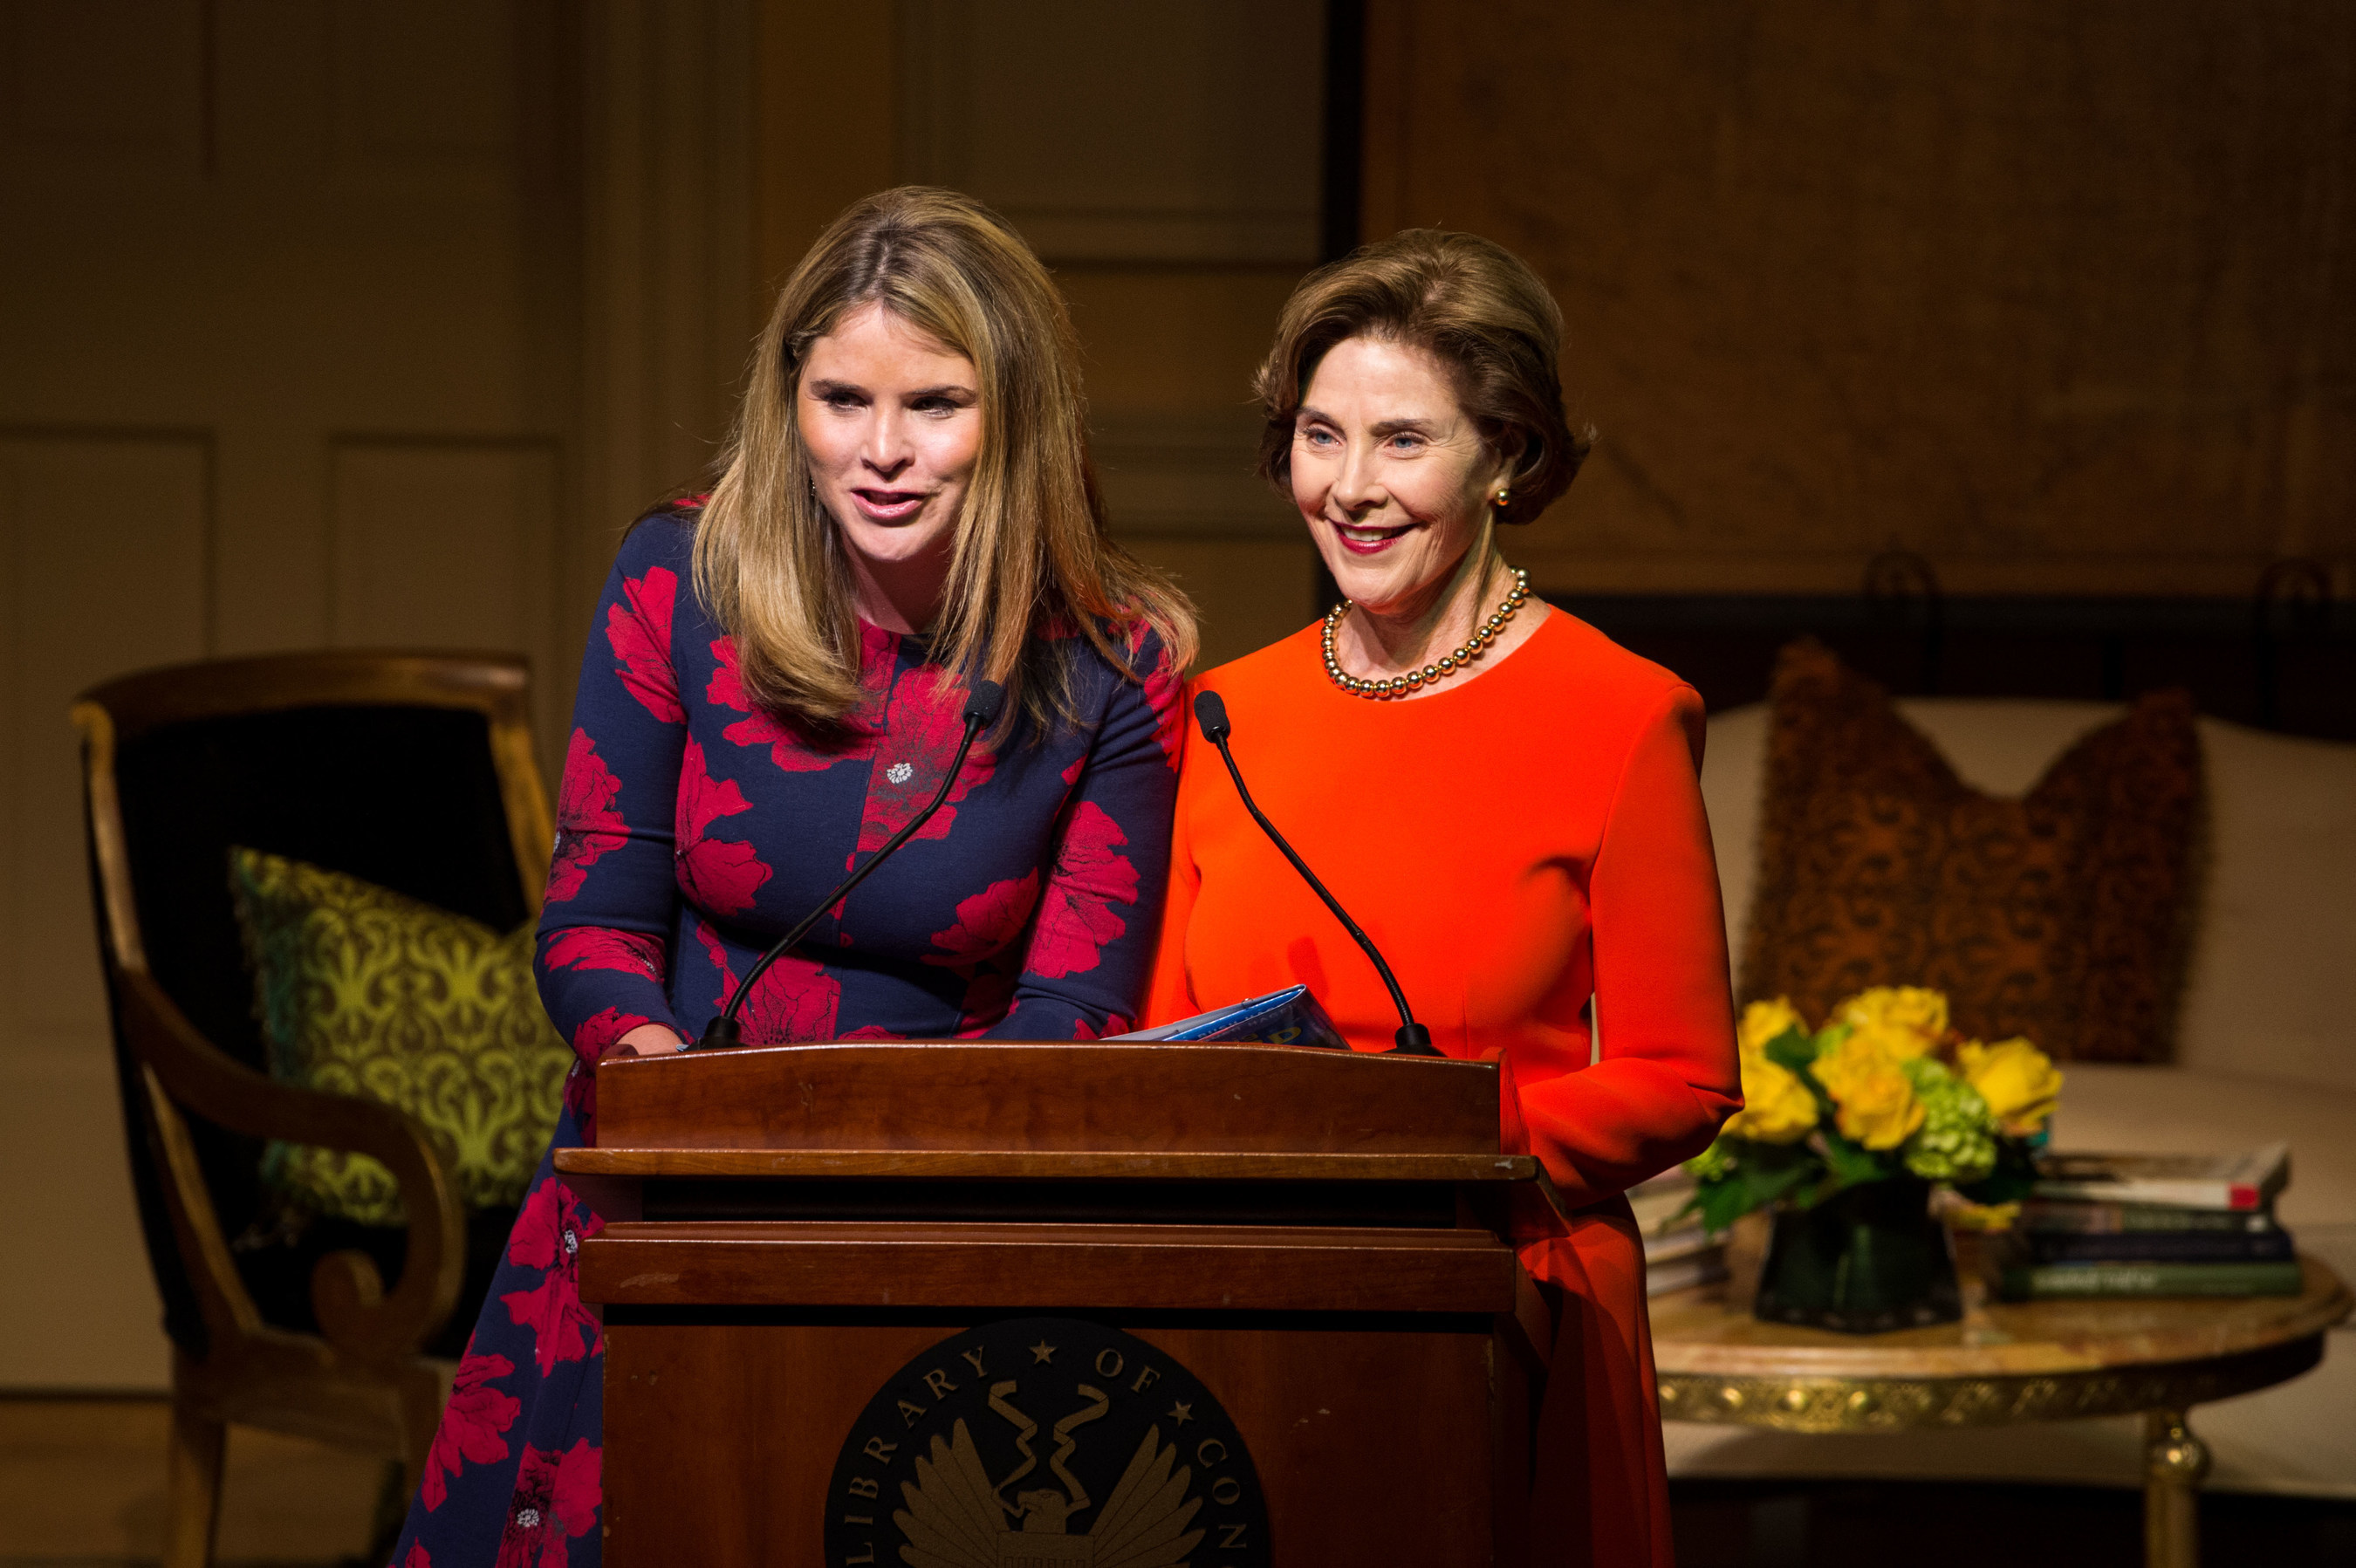 Jenna Bush Hager and Laura Bush at the Barbara Bush Foundation's National Celebration of Reading